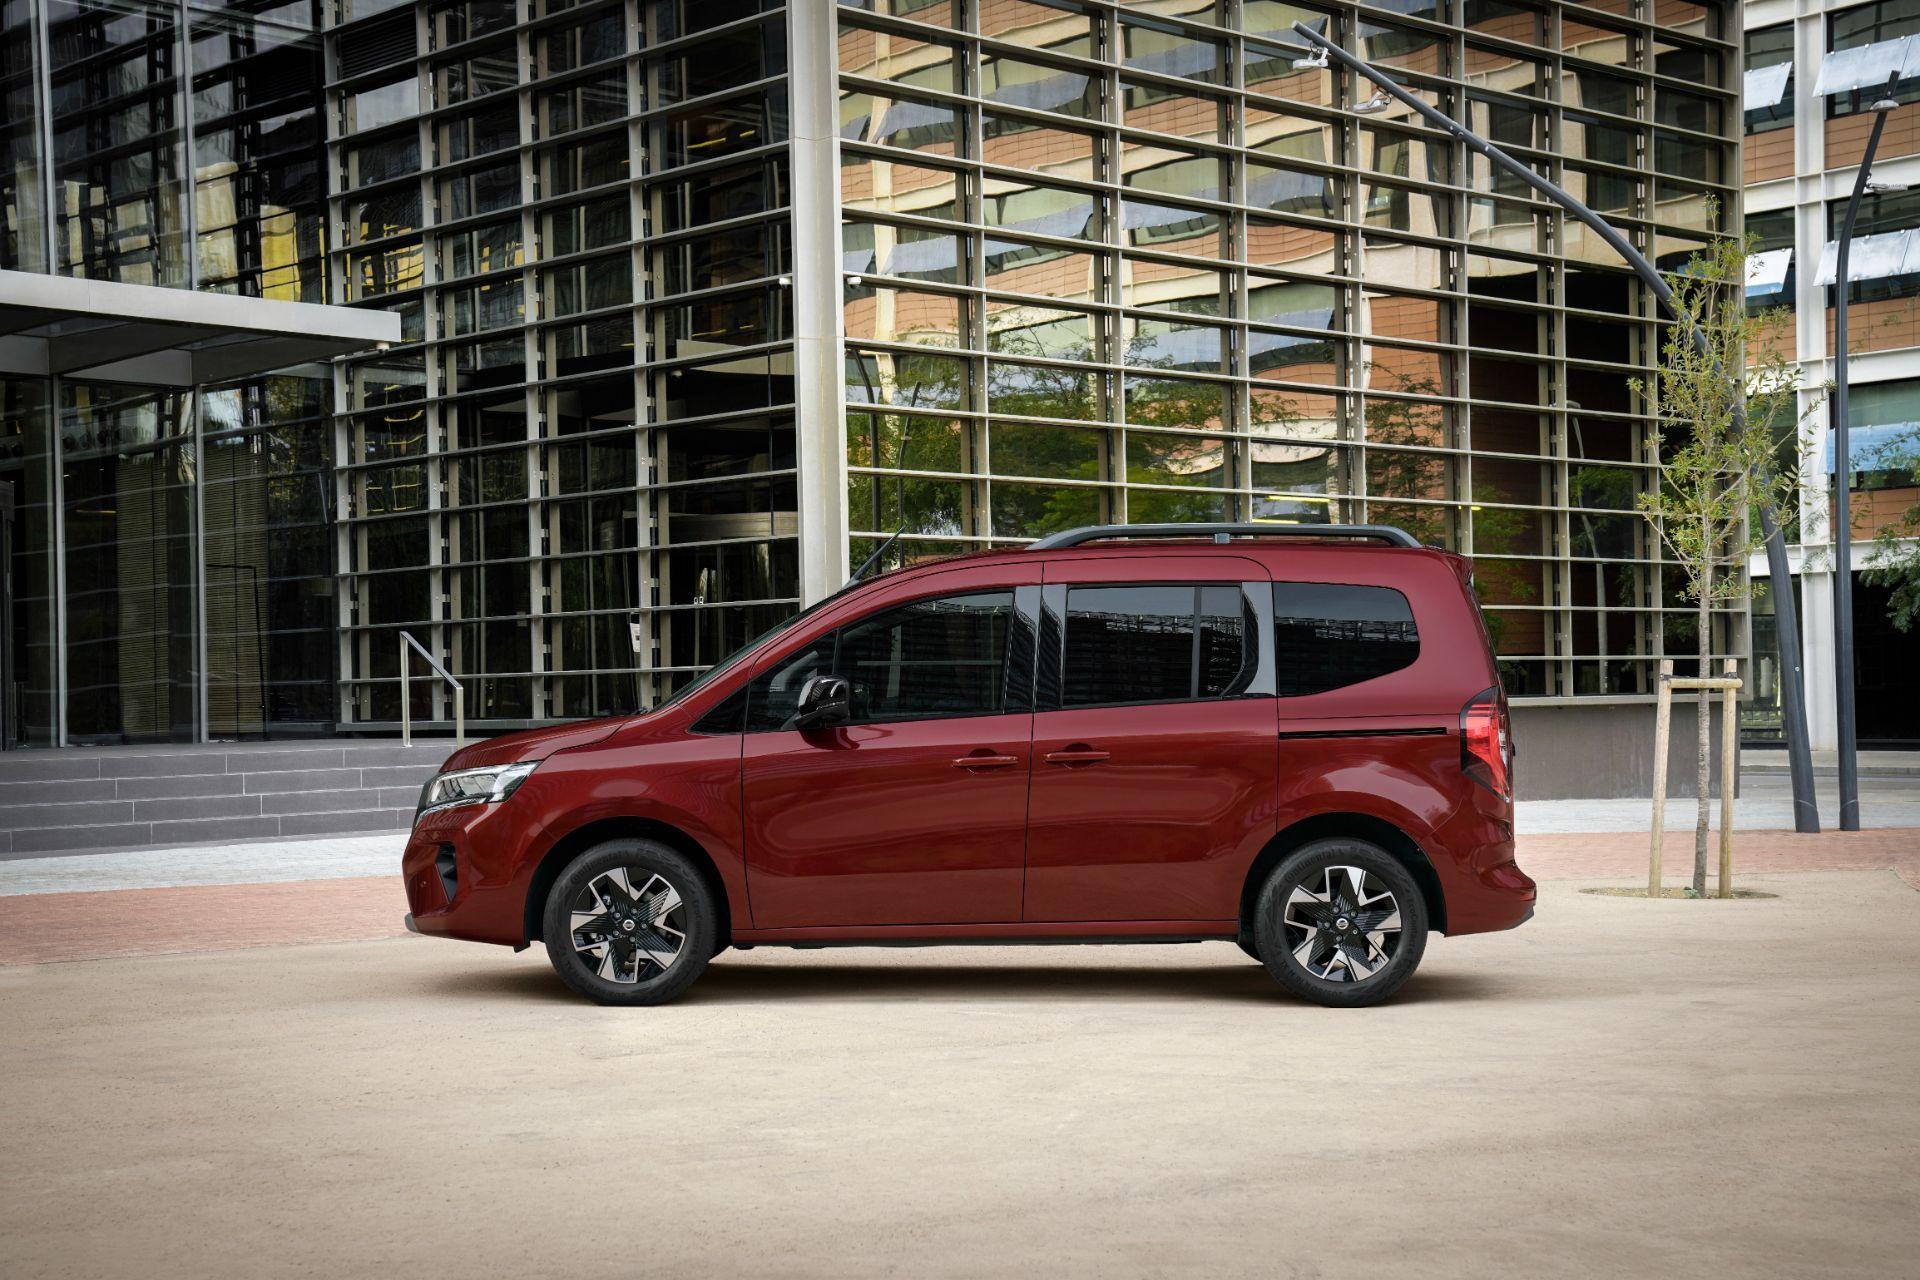 2022-Nissan-Townstar-petrol-combi-dynamic-4